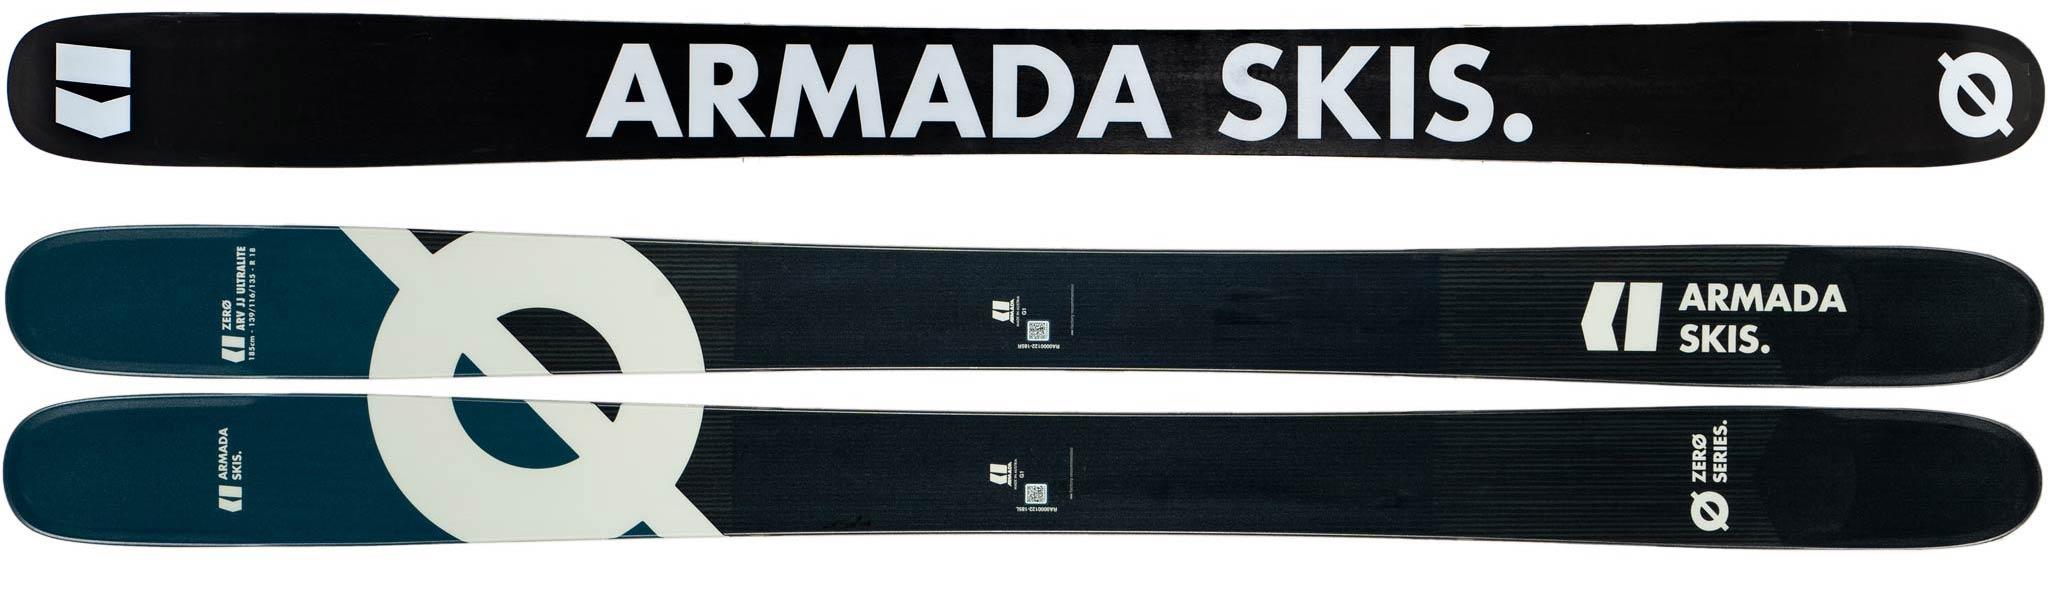 Armada Skis 2019/2020 - ARV JJ Ultralite: Topsheet und Base